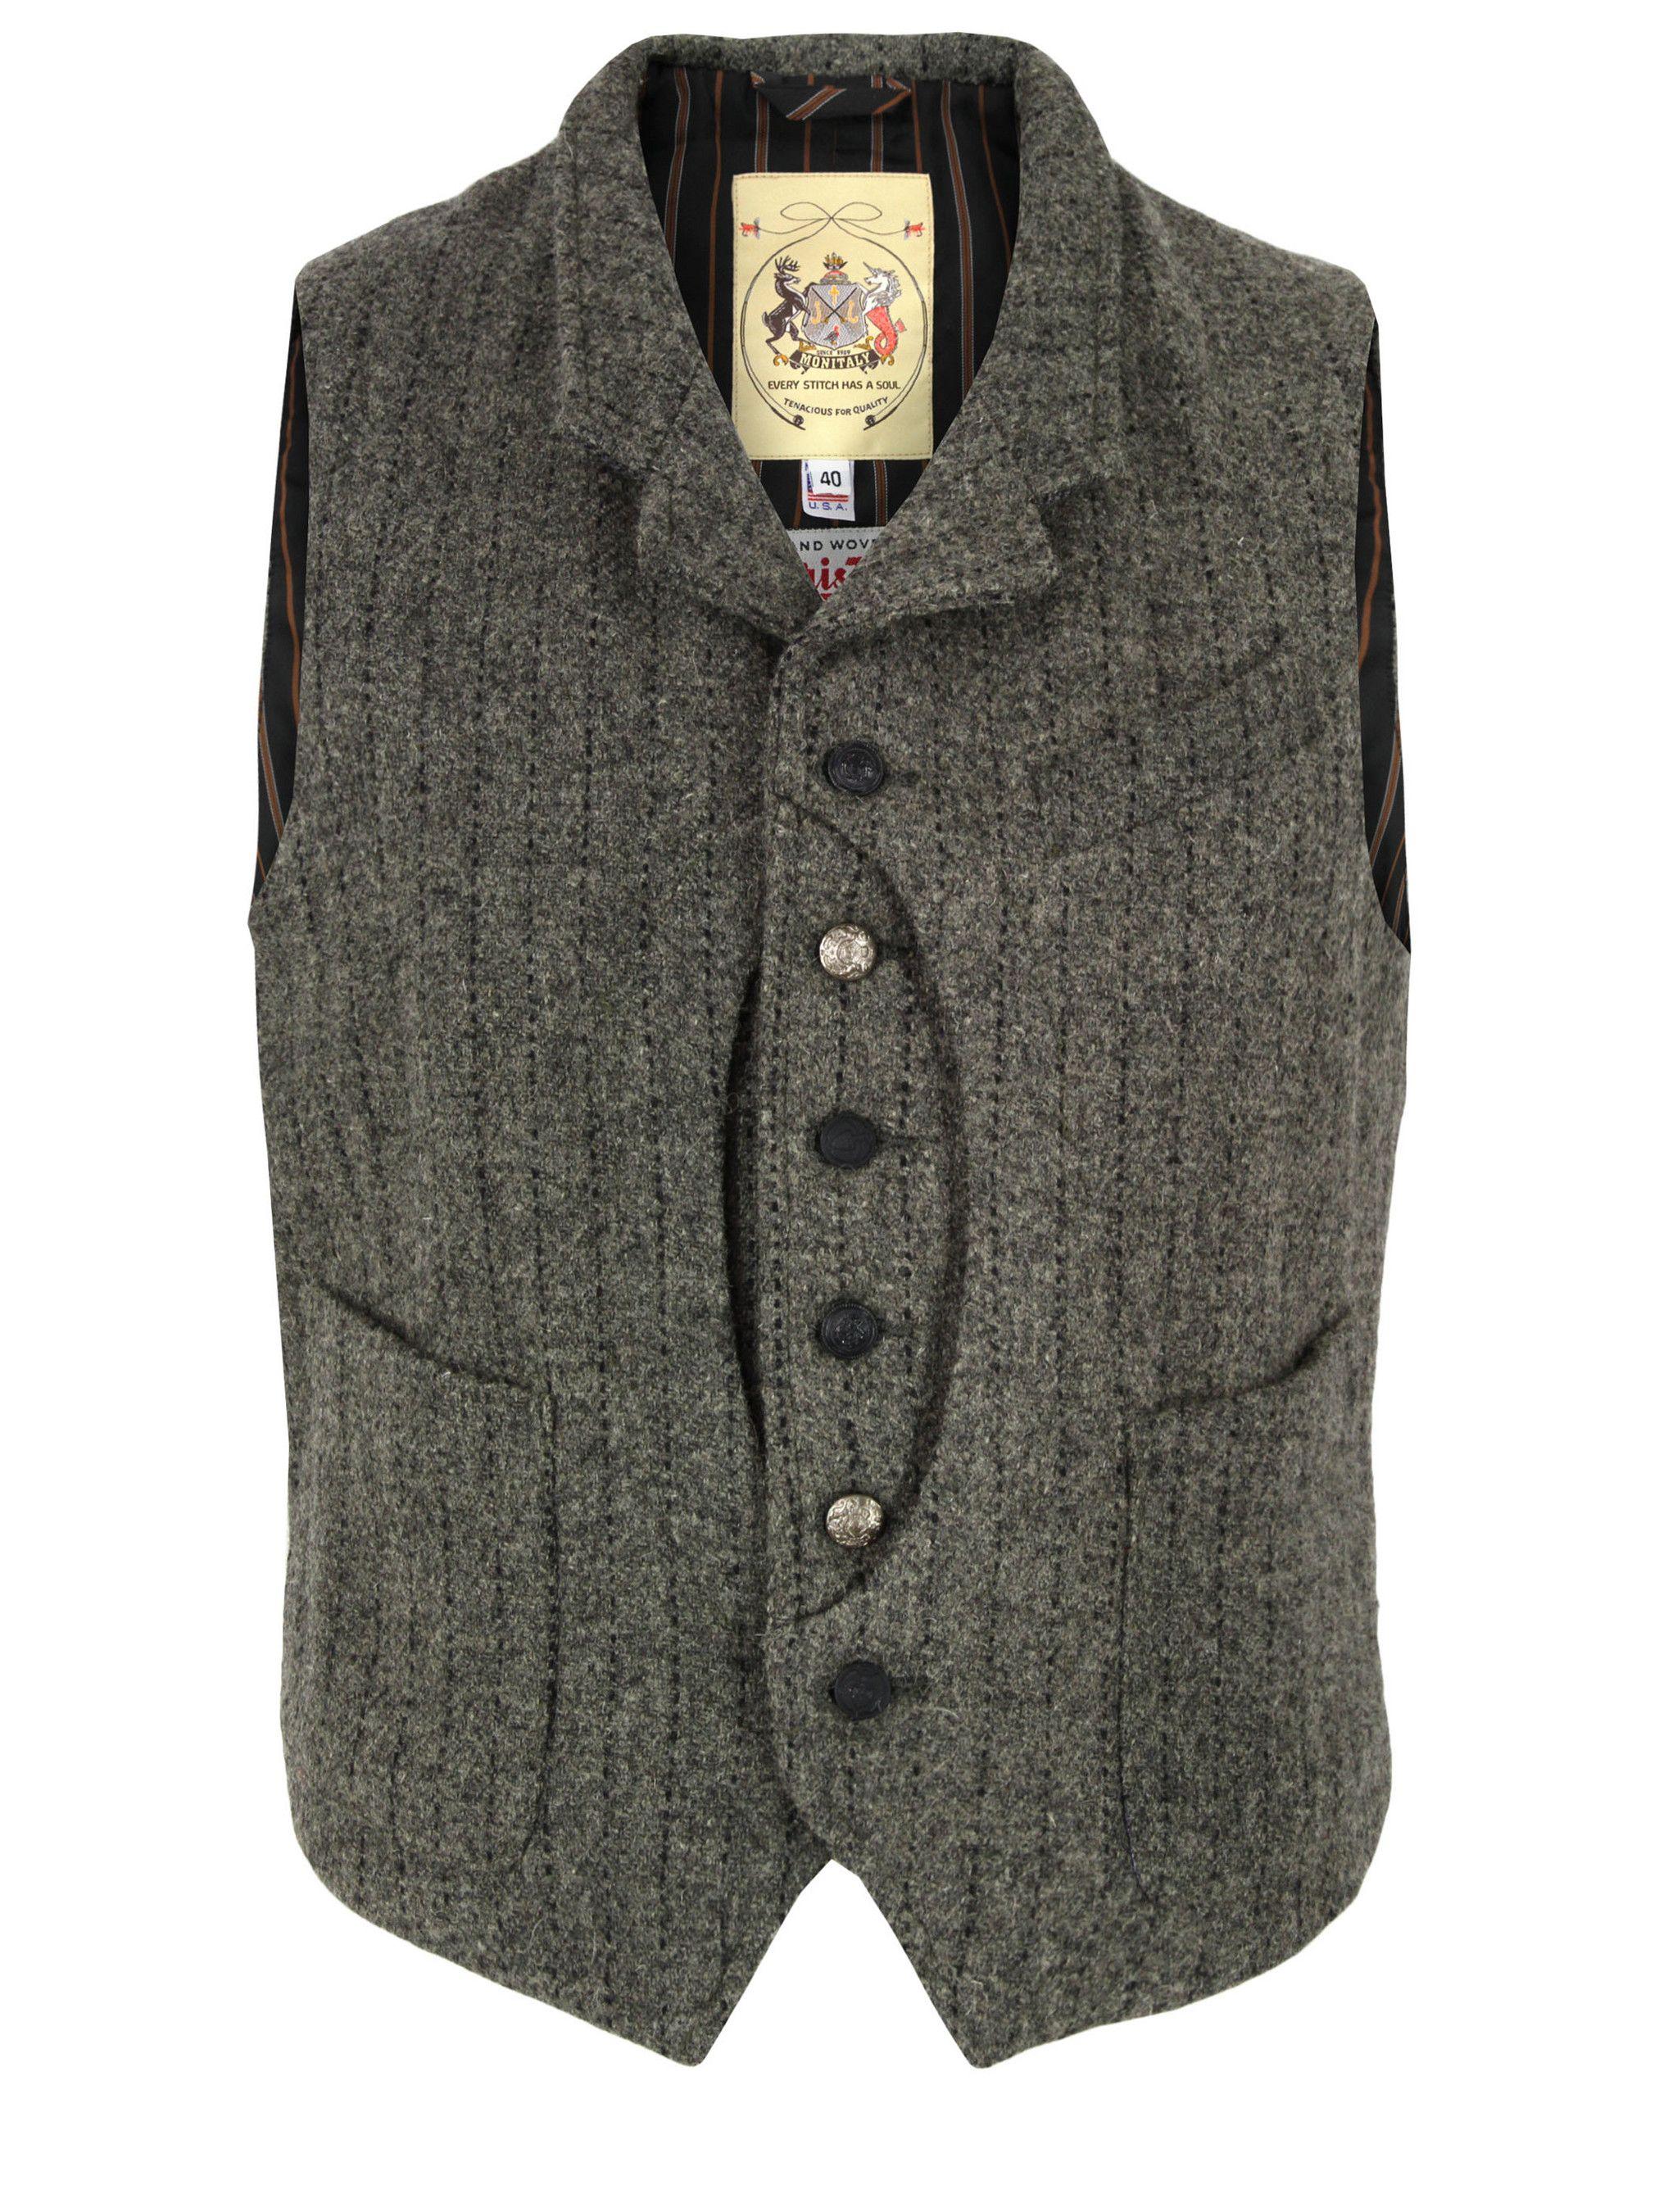 acfa3e876e7c2 Coggles Monitaly Grey Harris Tweed Hunting Vest | prslook | Mens ...